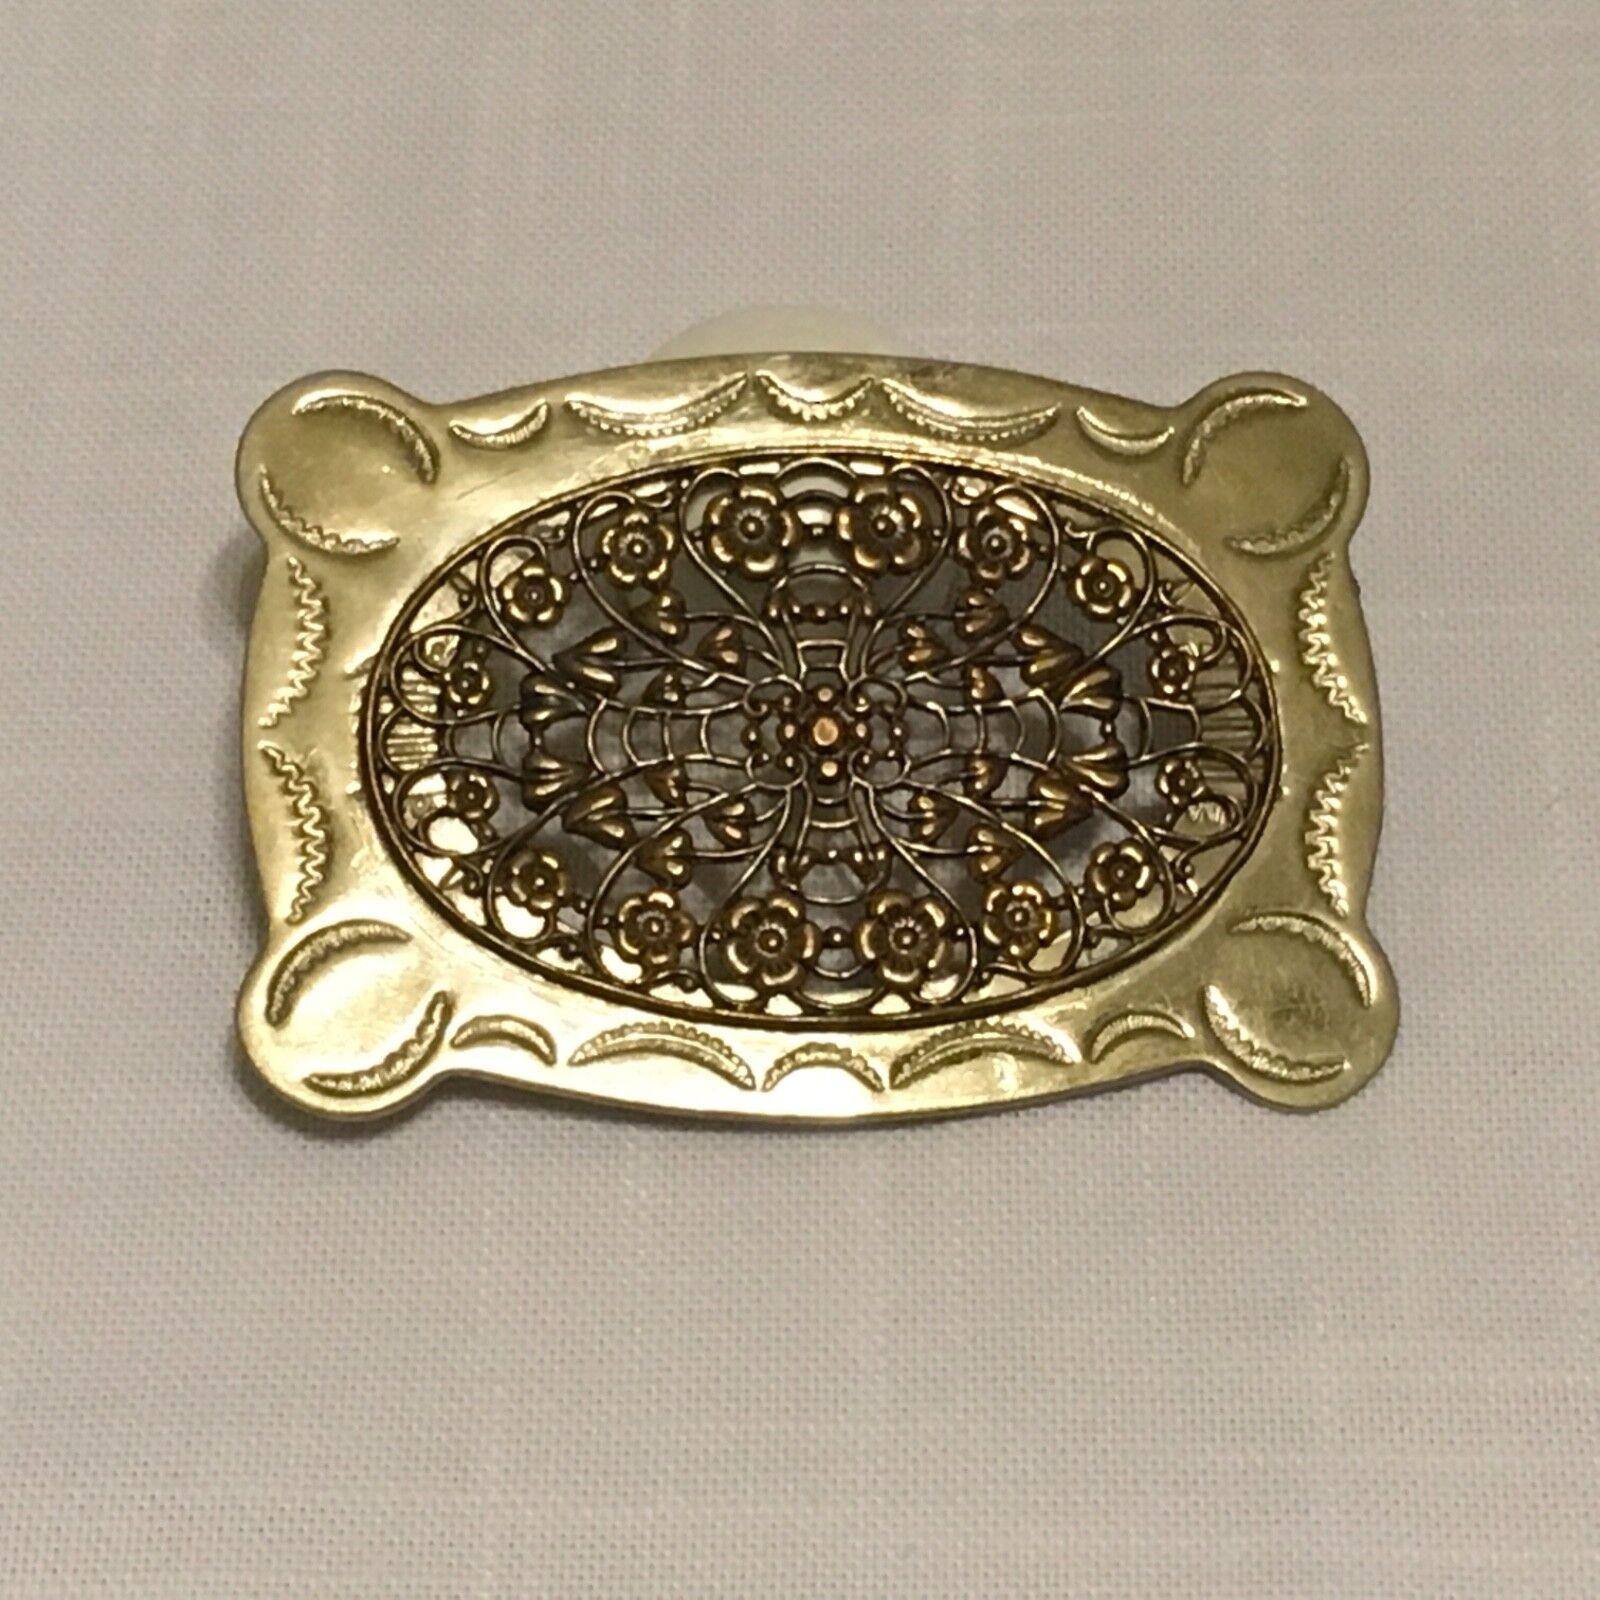 Women's Belt Buckle ~ Intricately Cutout Flower Design ~ Silver & Gold Colors